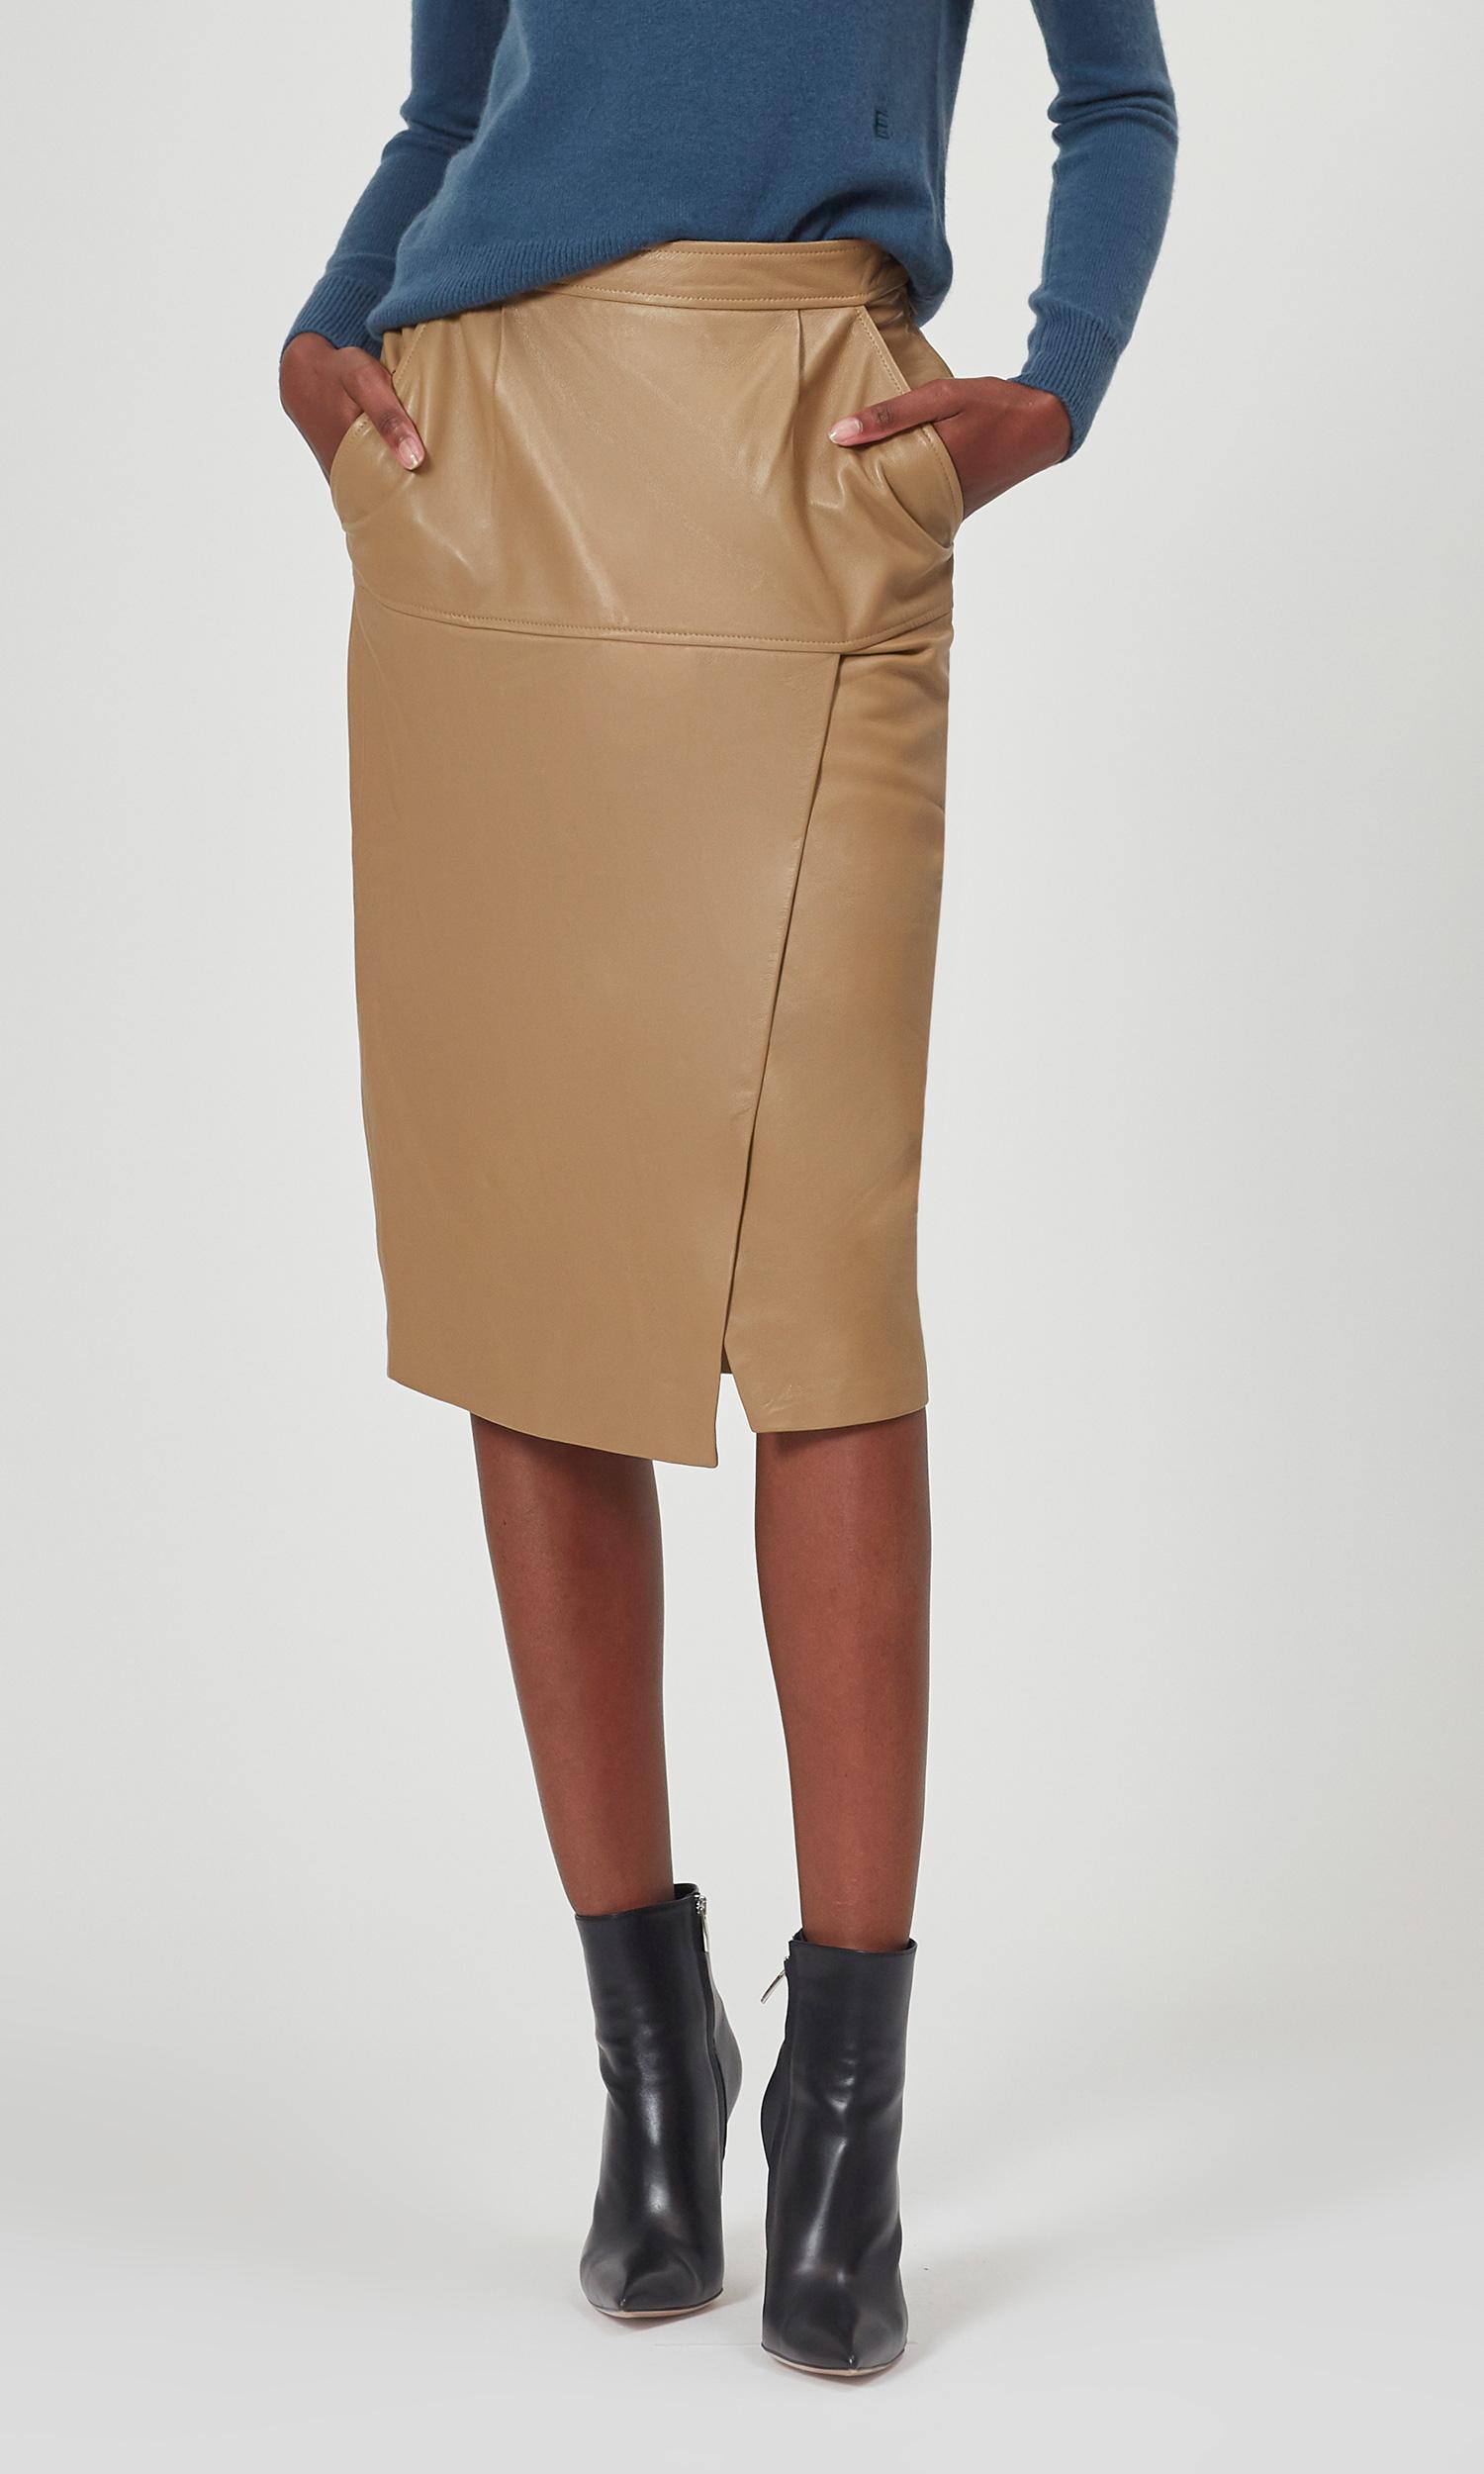 Khloelle Leather Skirt by Equipment